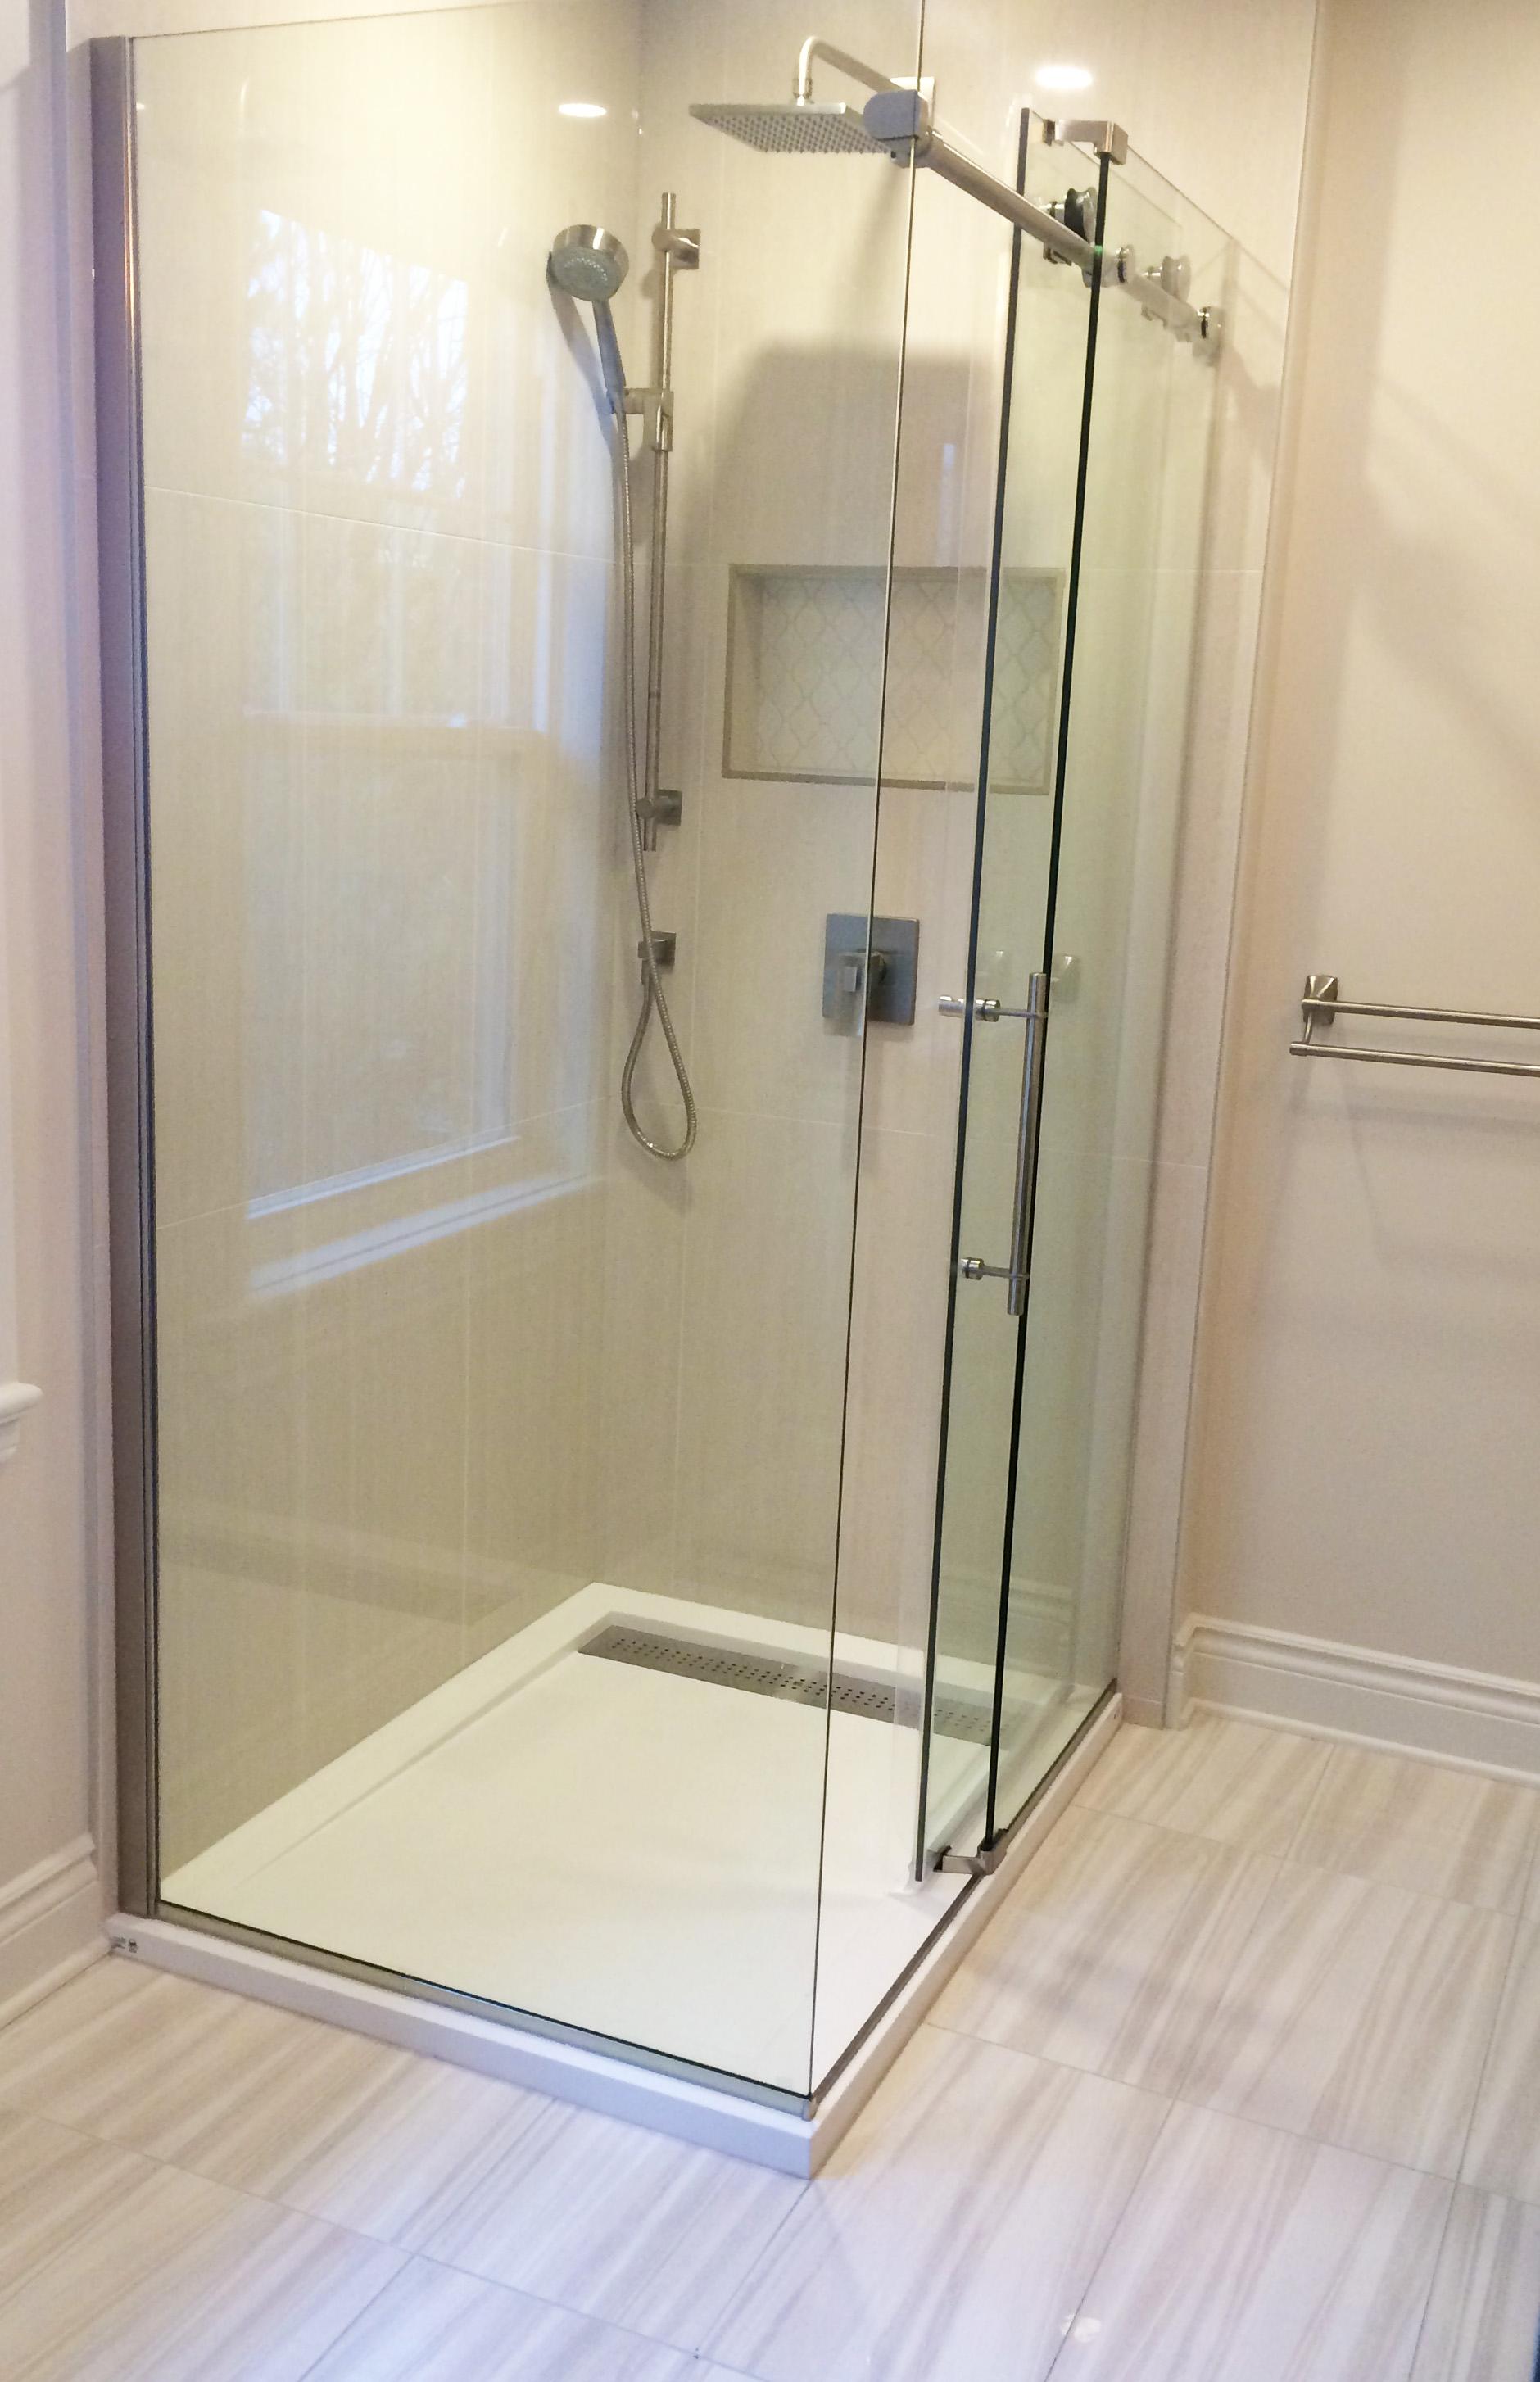 Bathroom - Glass Shower